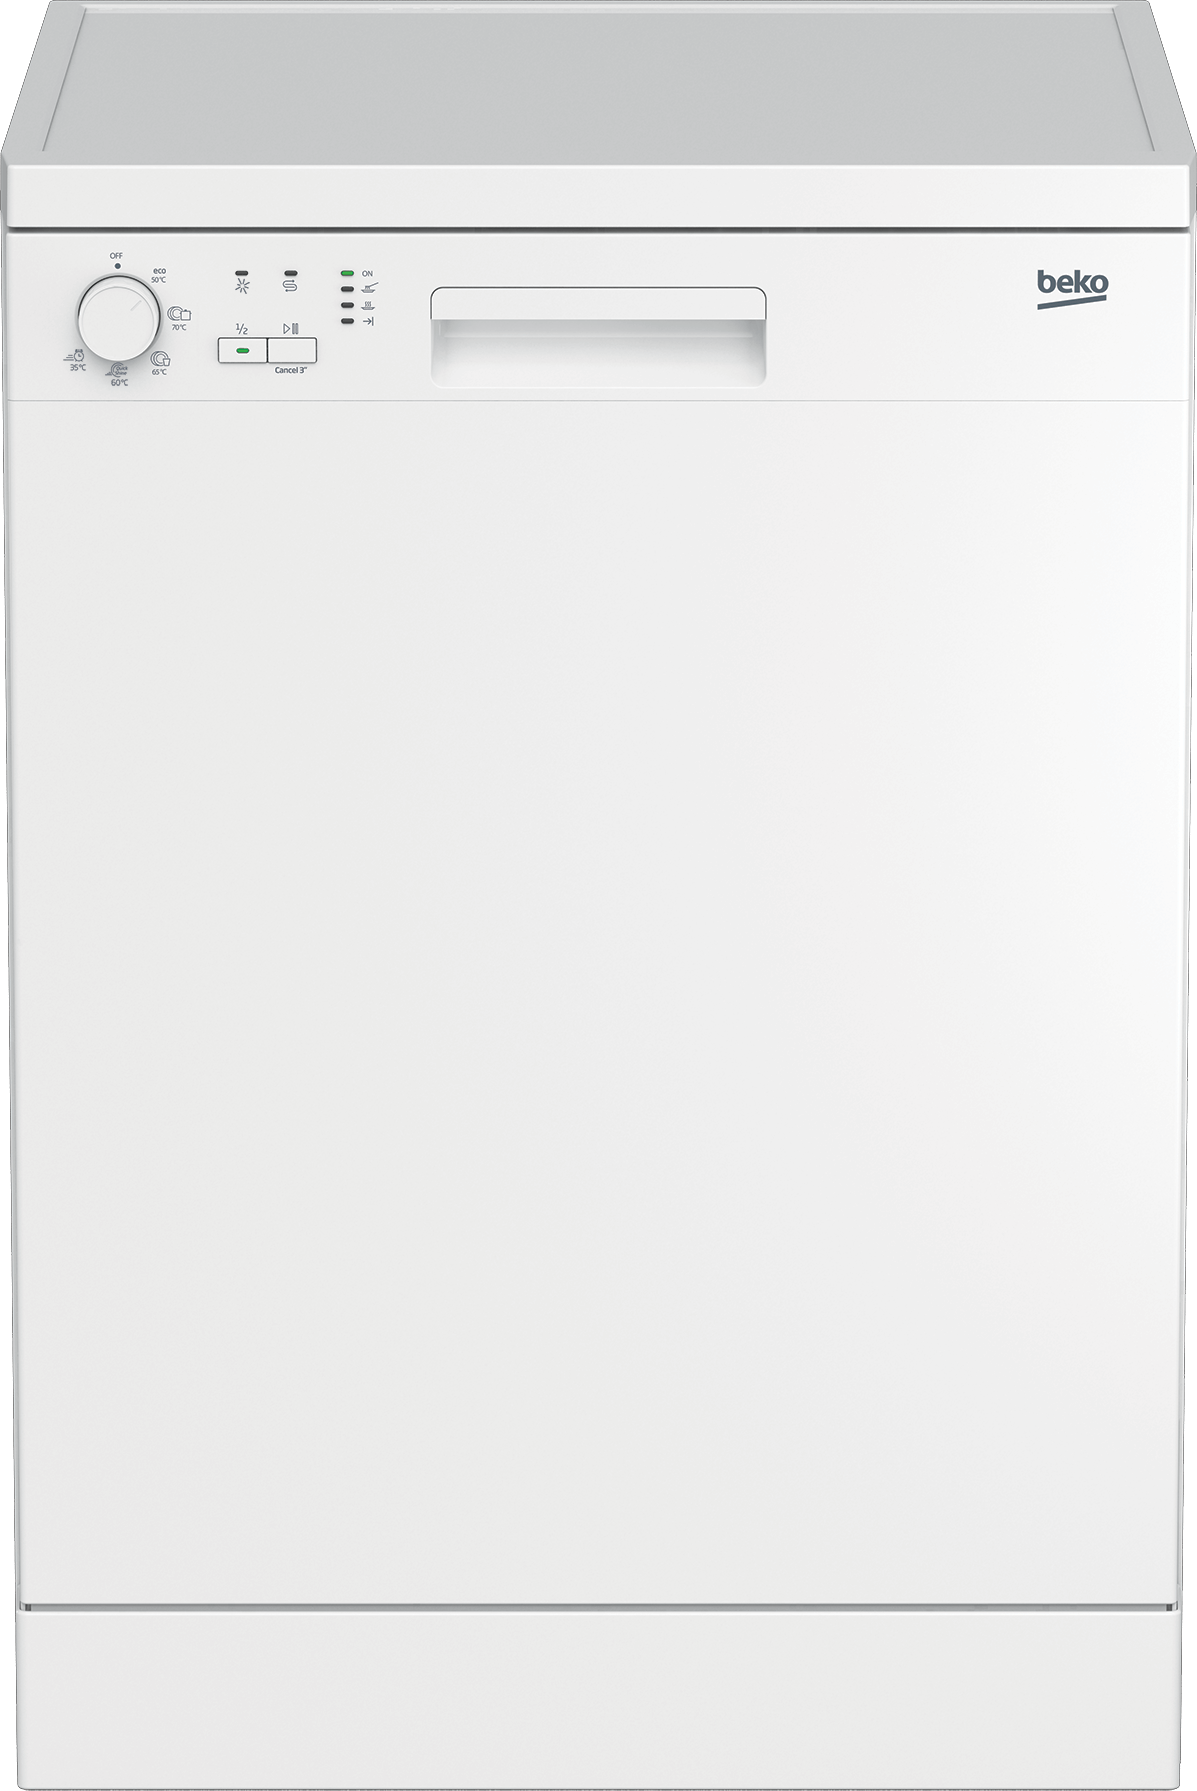 Máy rửa chén độc lập DFN05311W